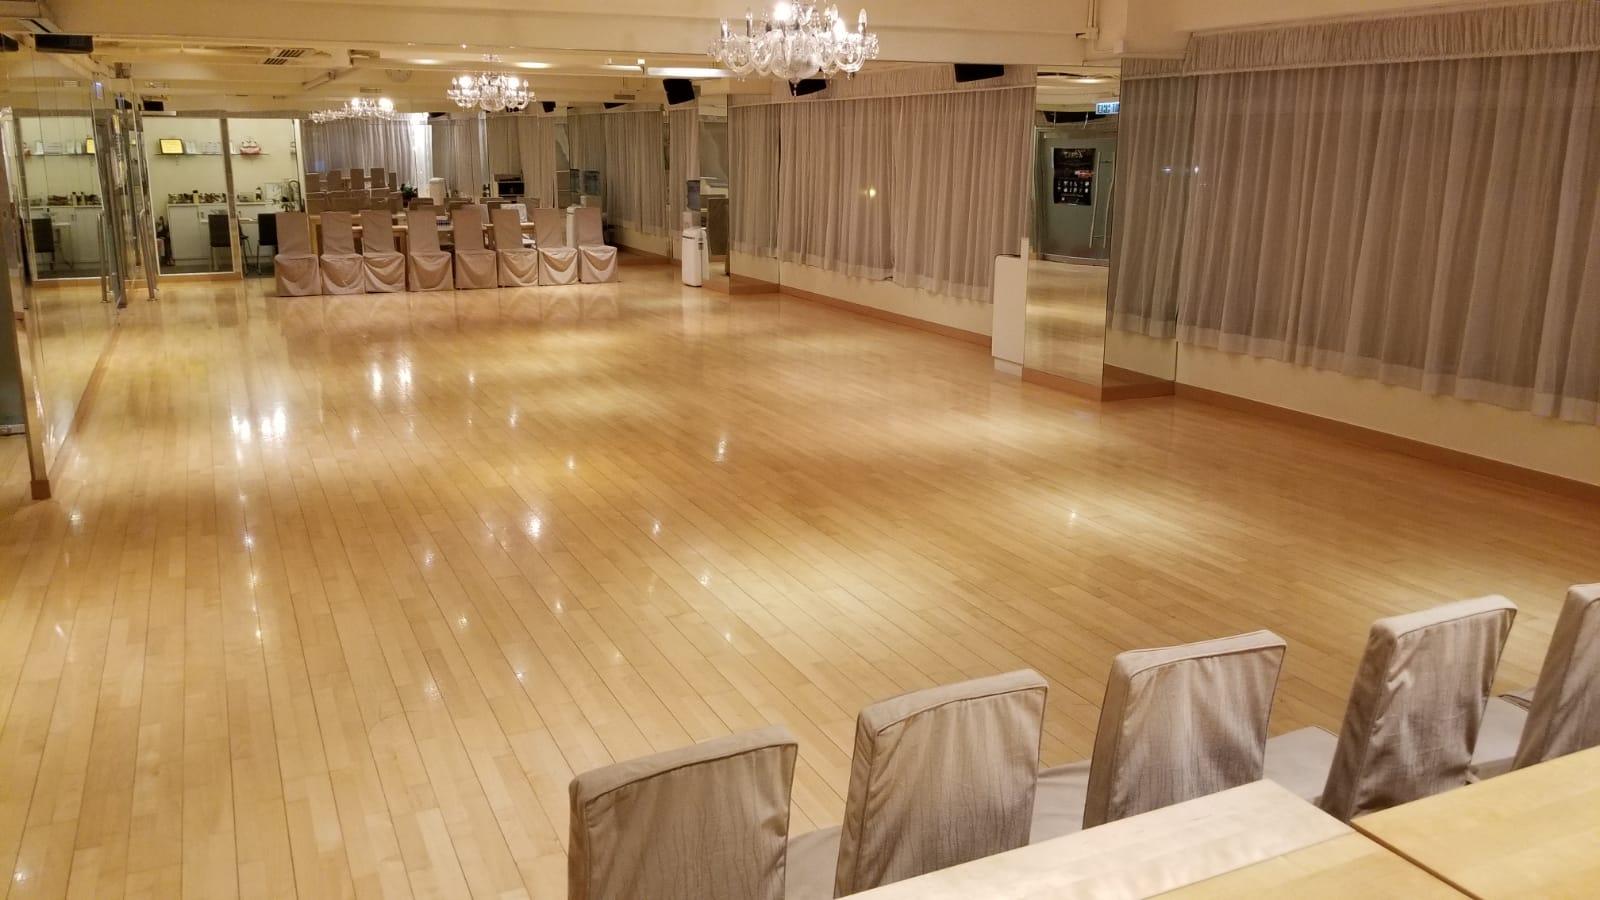 floor,flooring,hardwood,wood,wood flooring